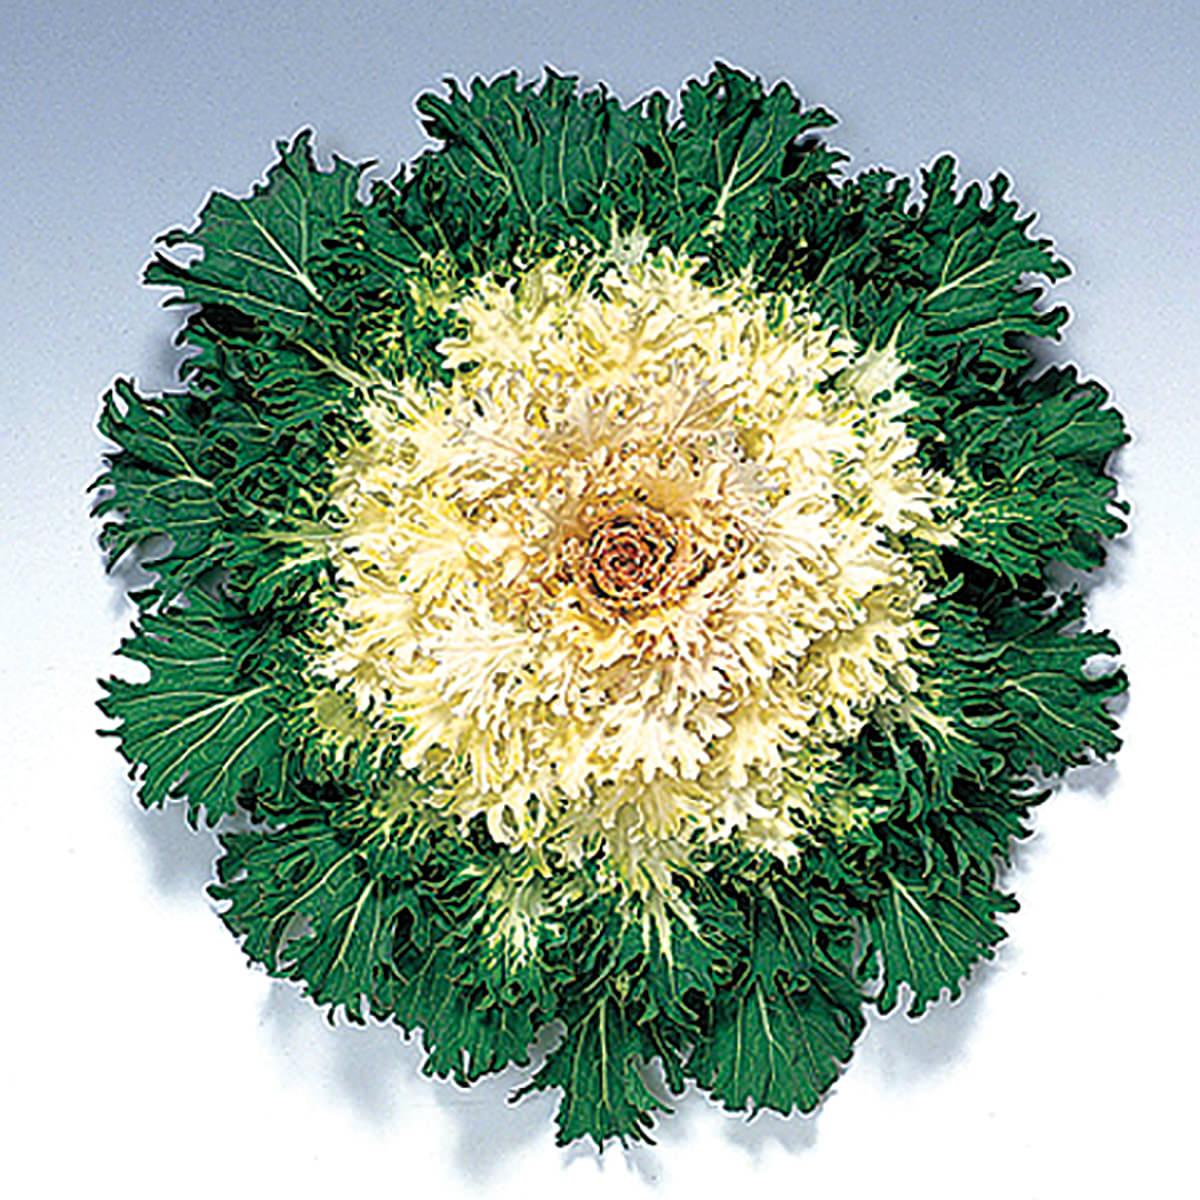 Coral Prince F1 Hybrid Ornamental Flowering Cabbage Kale Seeds